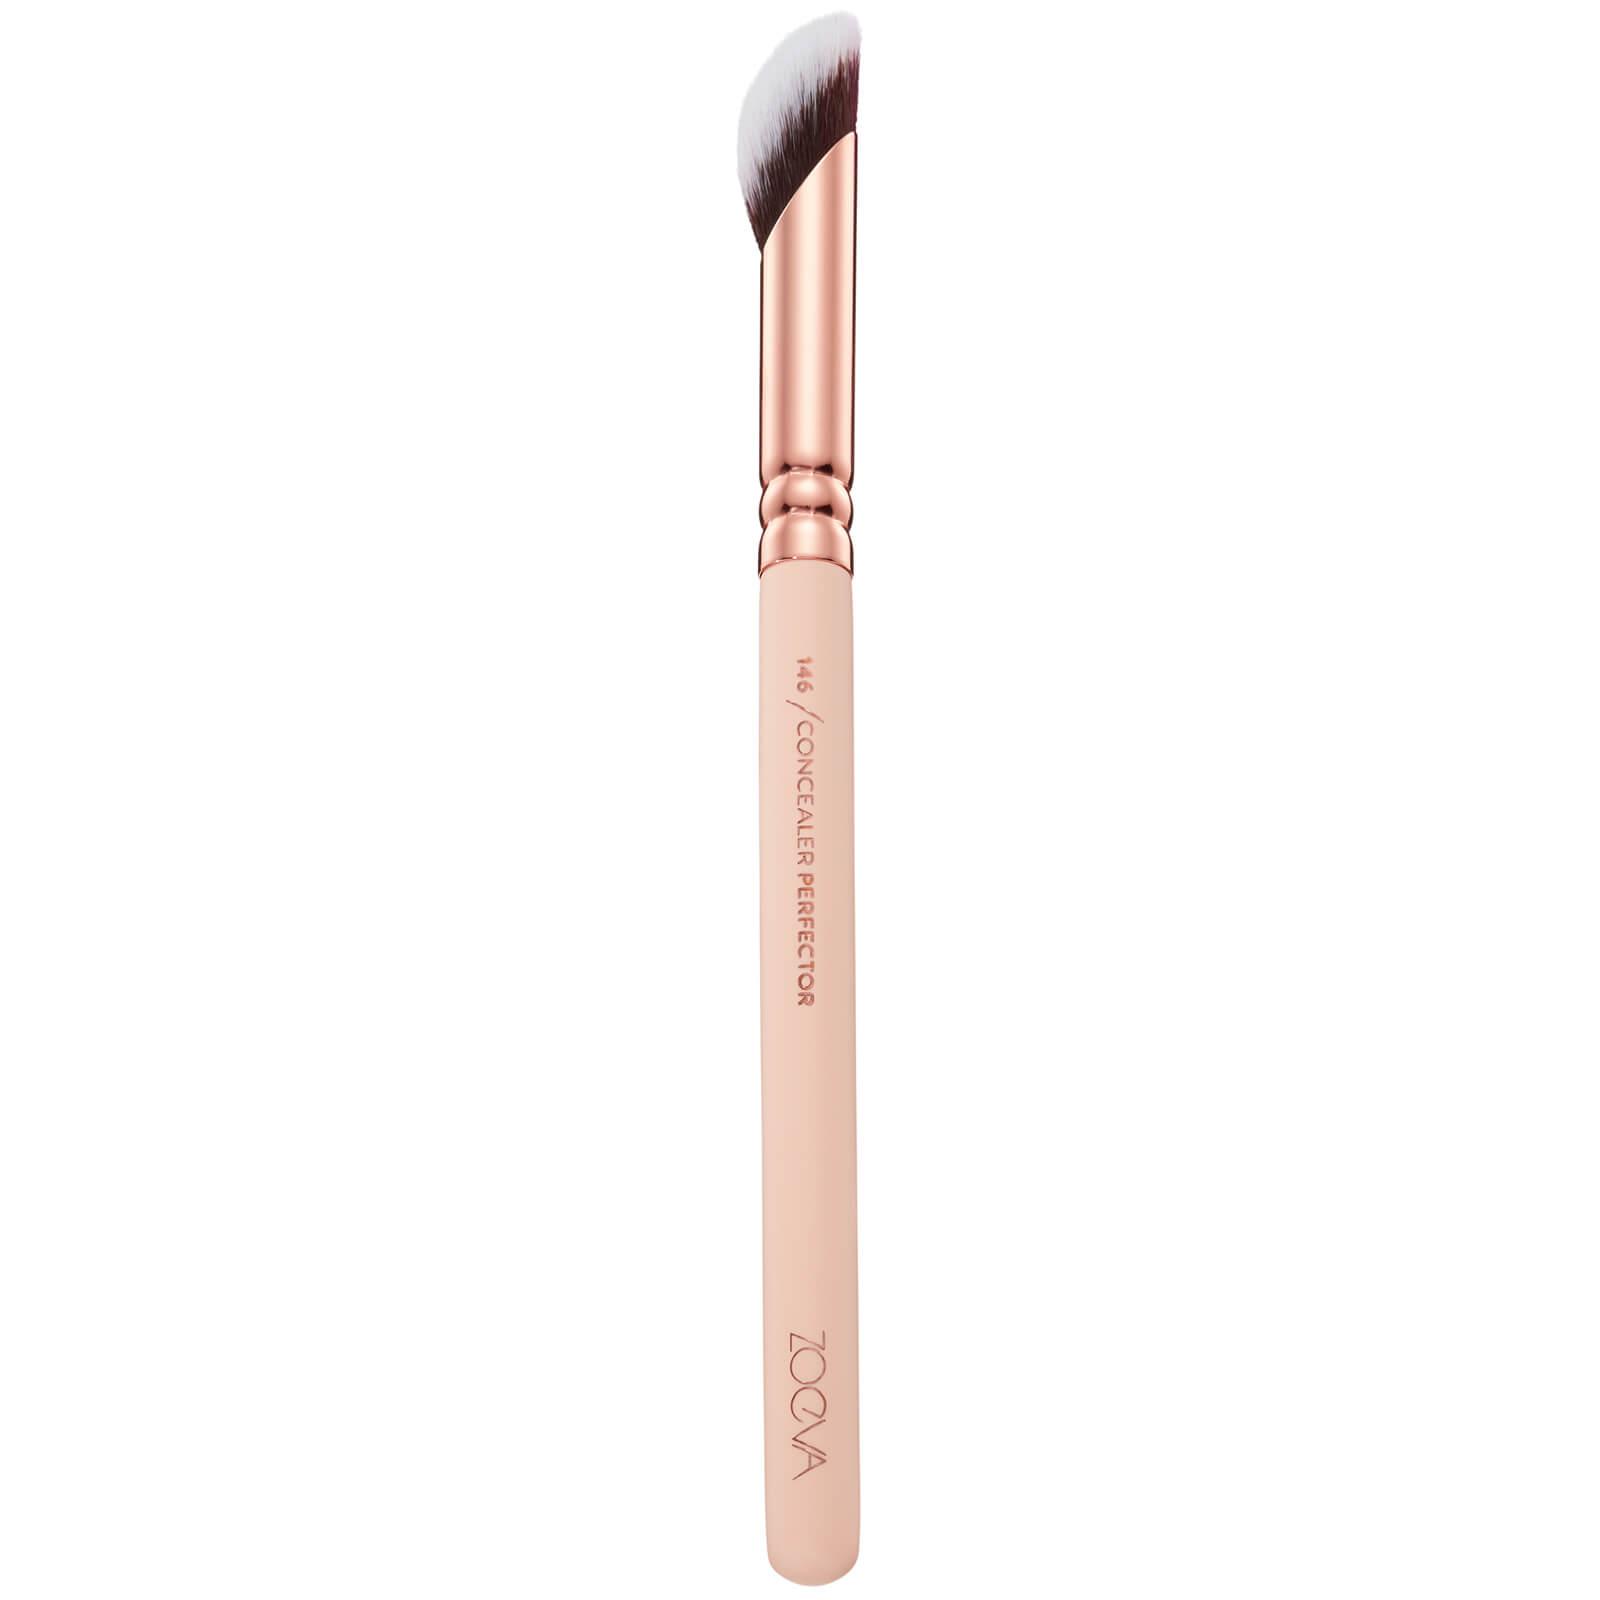 Купить ZOEVA 146 Concealer Perfector Rg Vol. 2 Brush